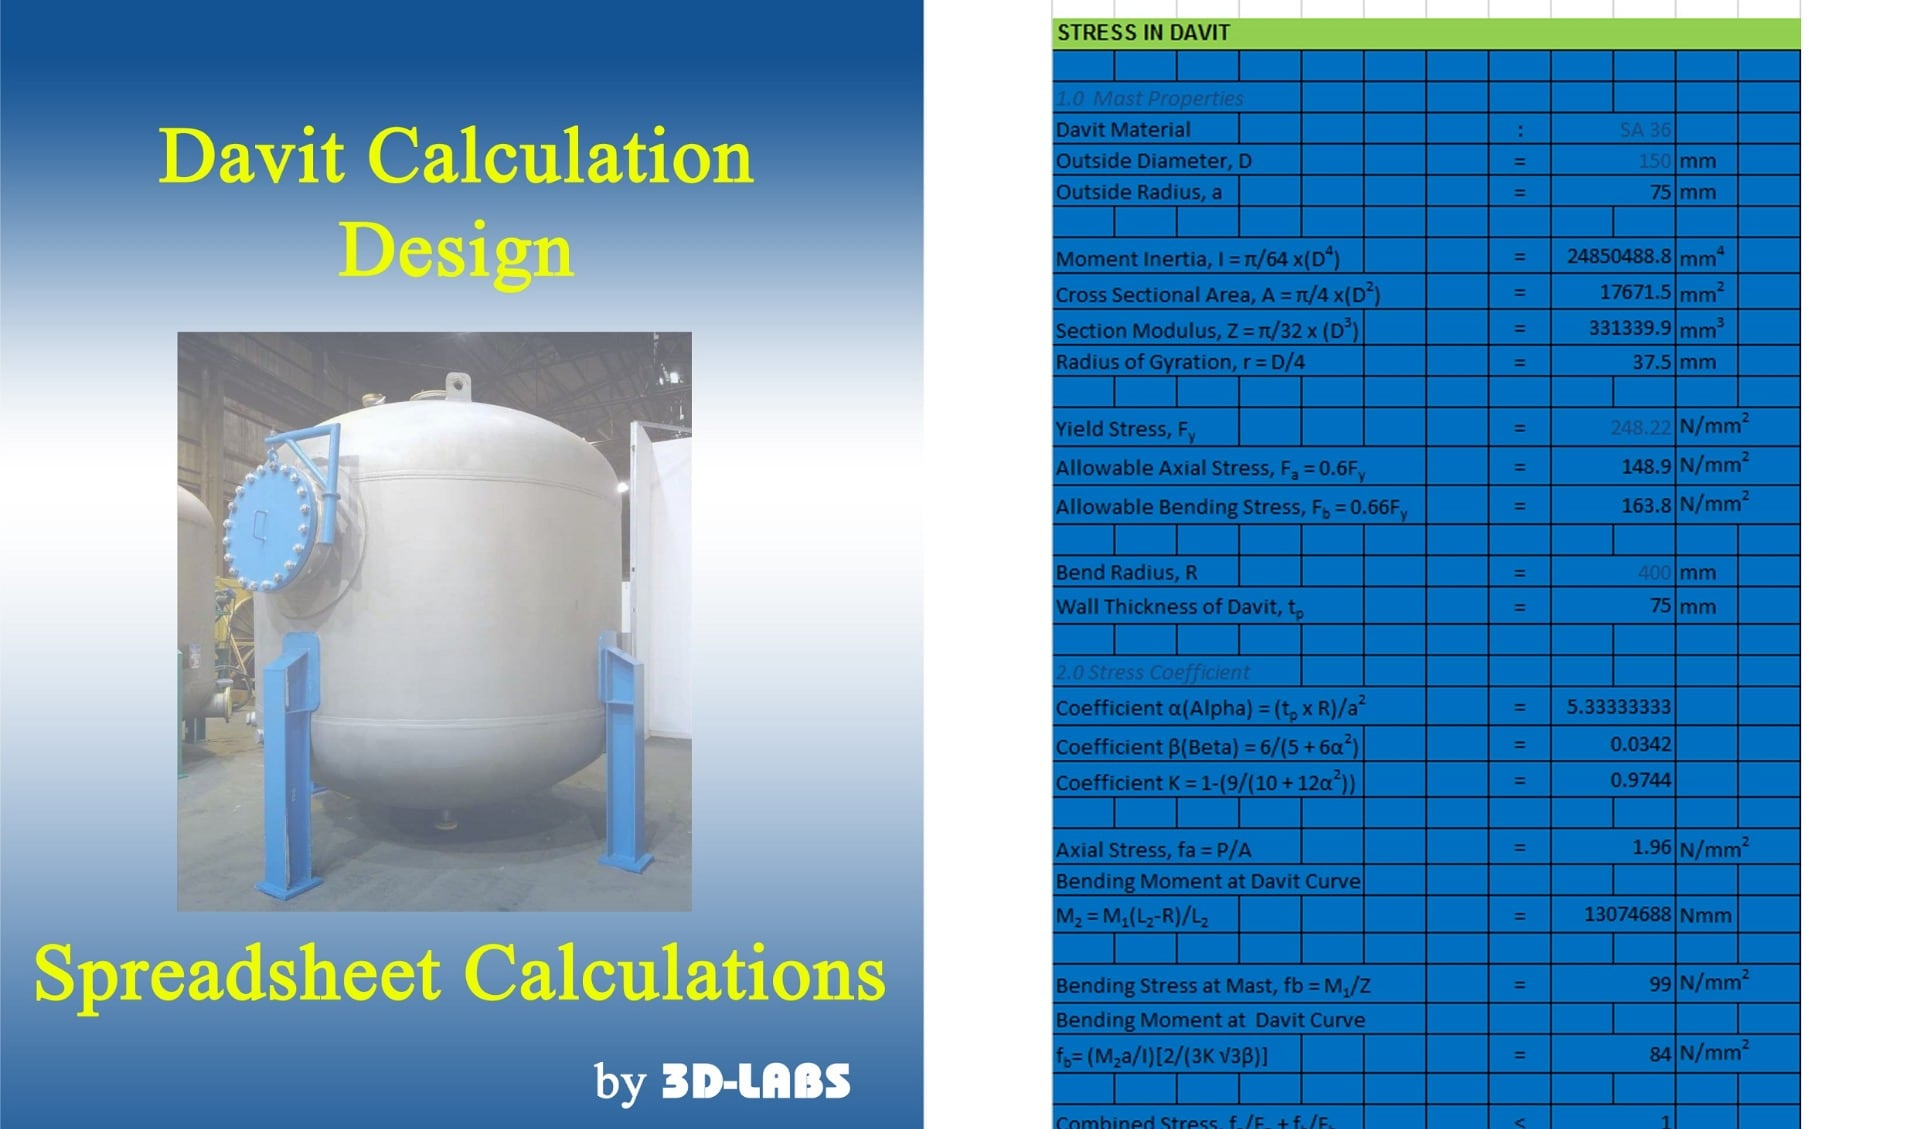 Davit Calculation Design